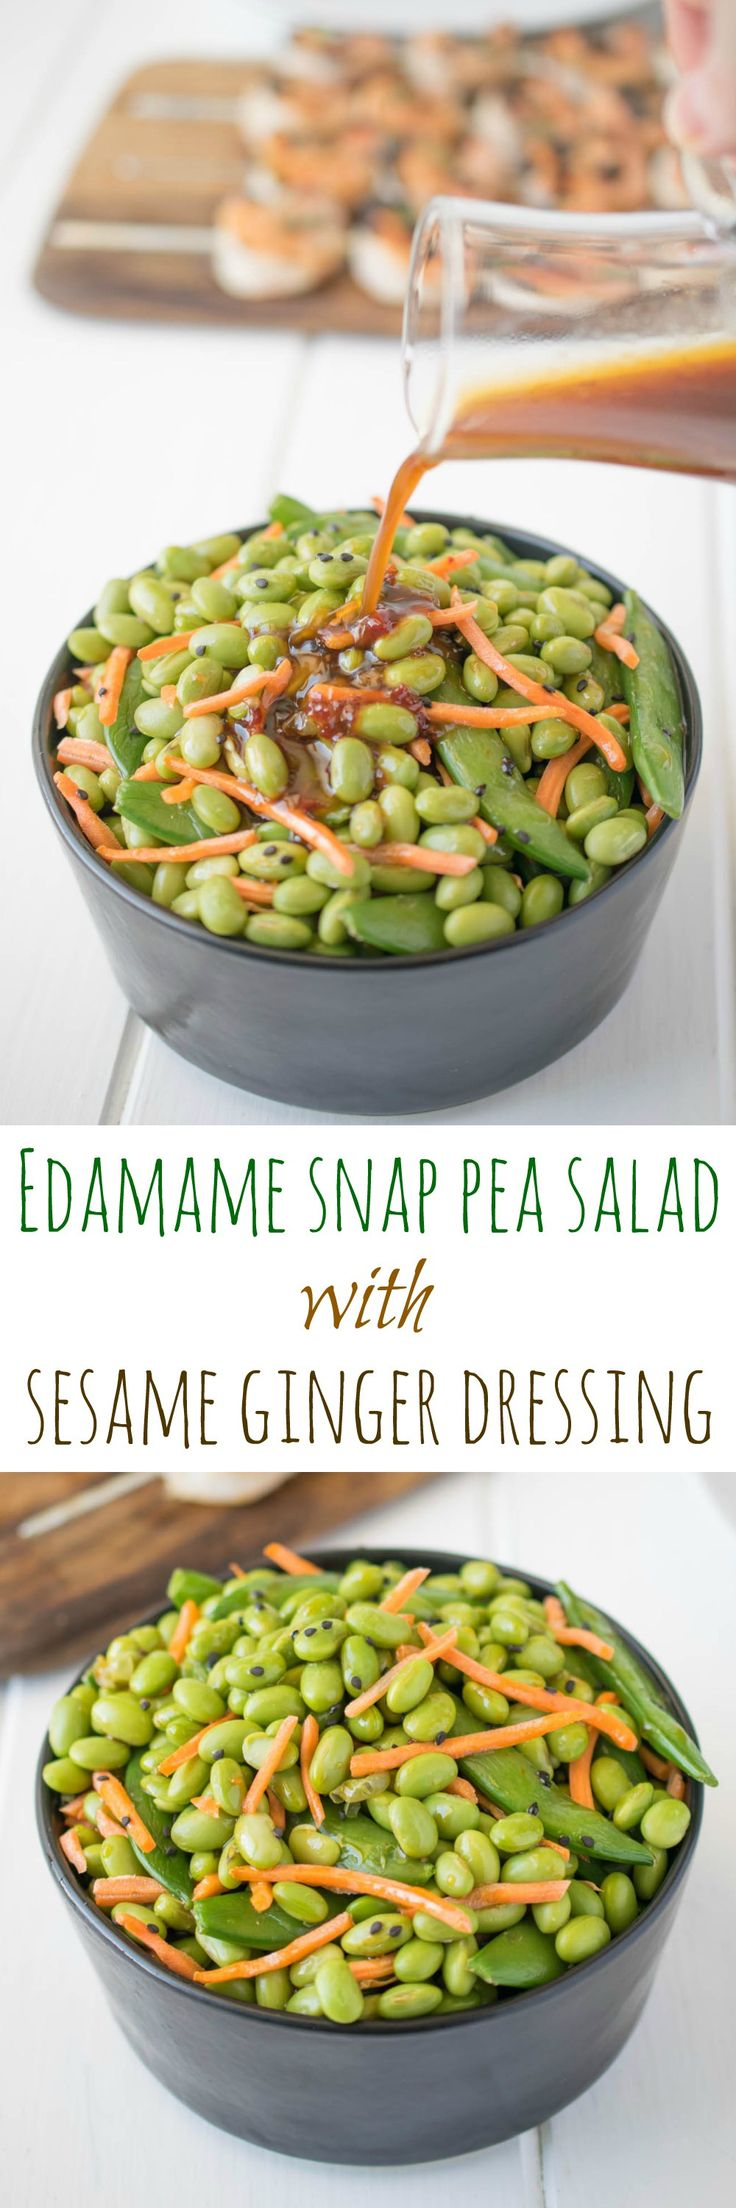 Edamame snap pea salad with sesame ginger dressing